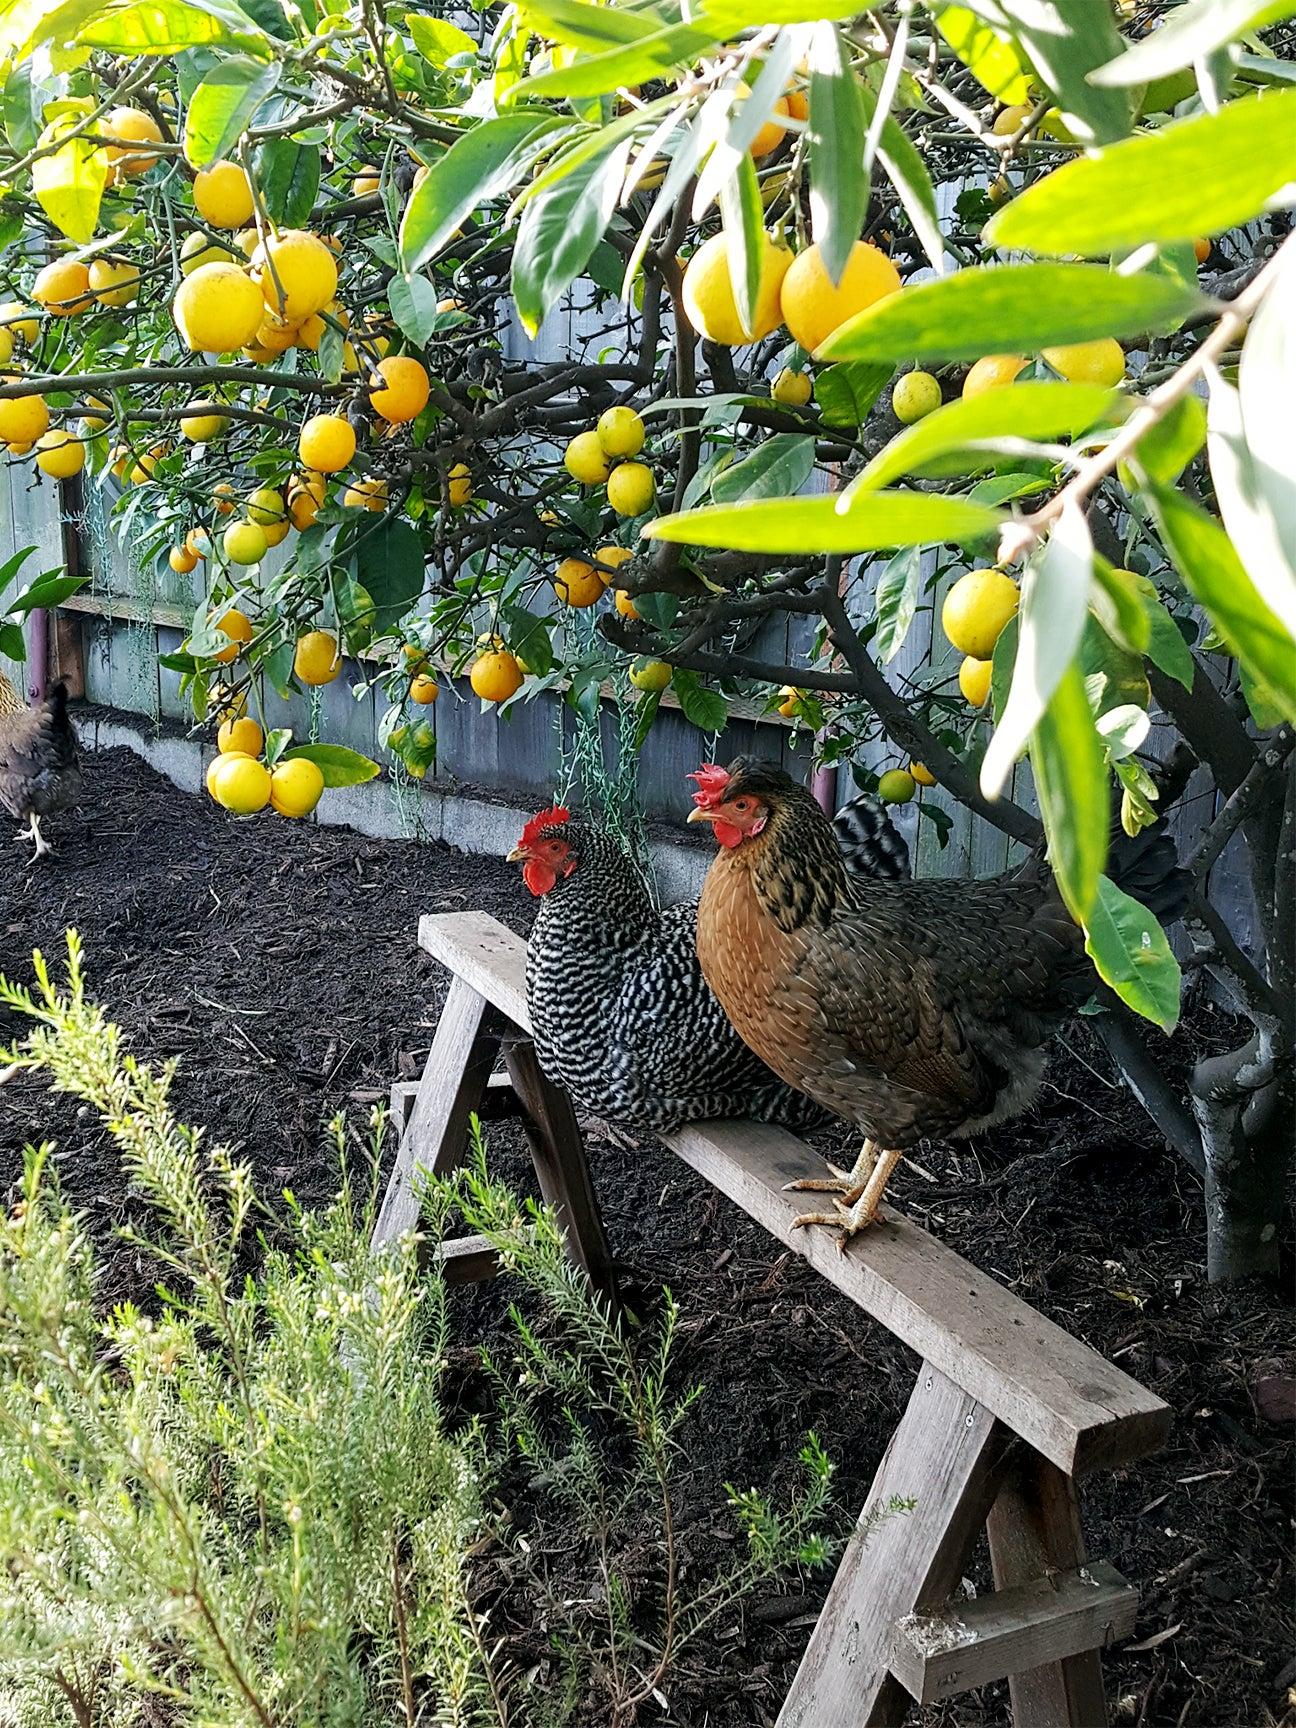 Chickens under a lemon tree